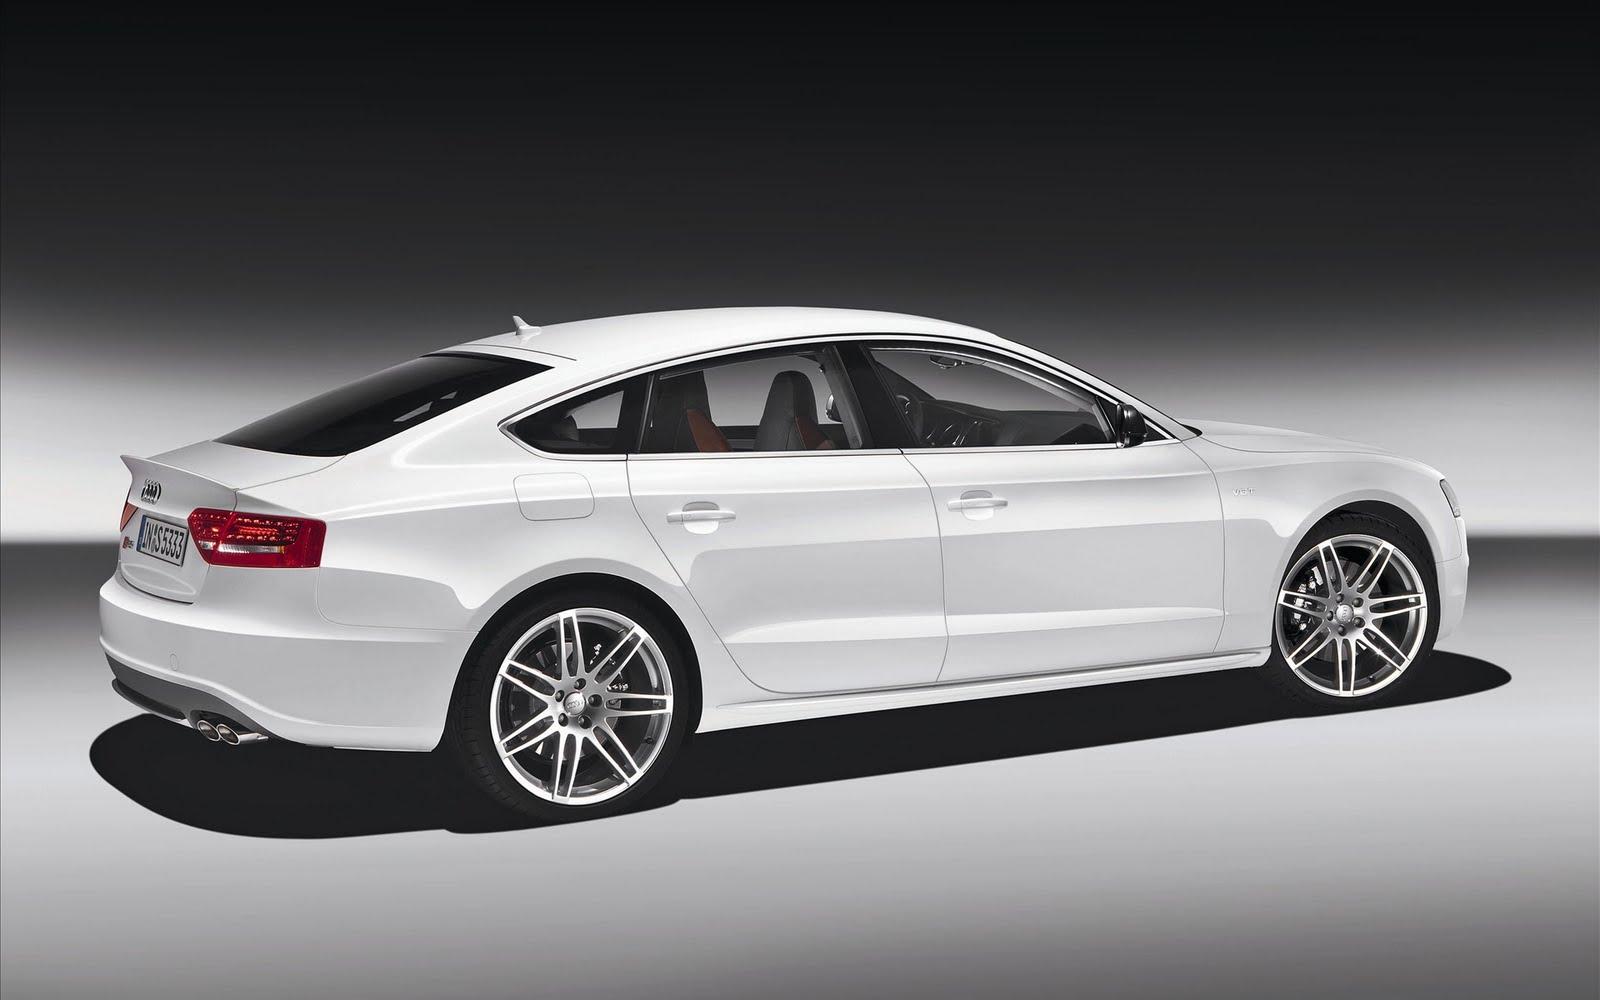 2011 Audi S5 Sportback ~ CAR WORLD